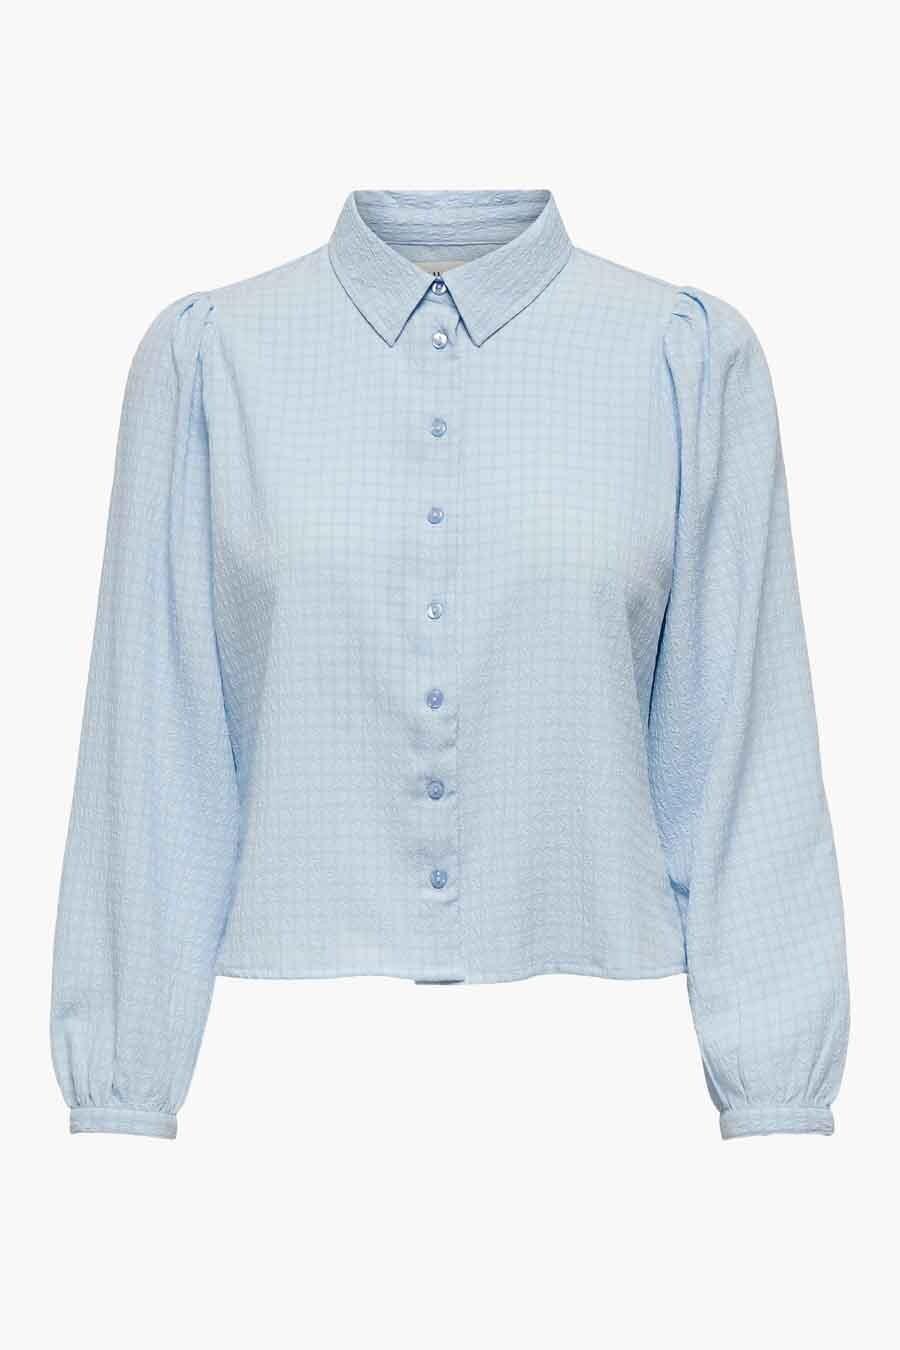 ONLY® Blouse lange mouwen, Blauw, Dames, Maat: XS/S/M/L